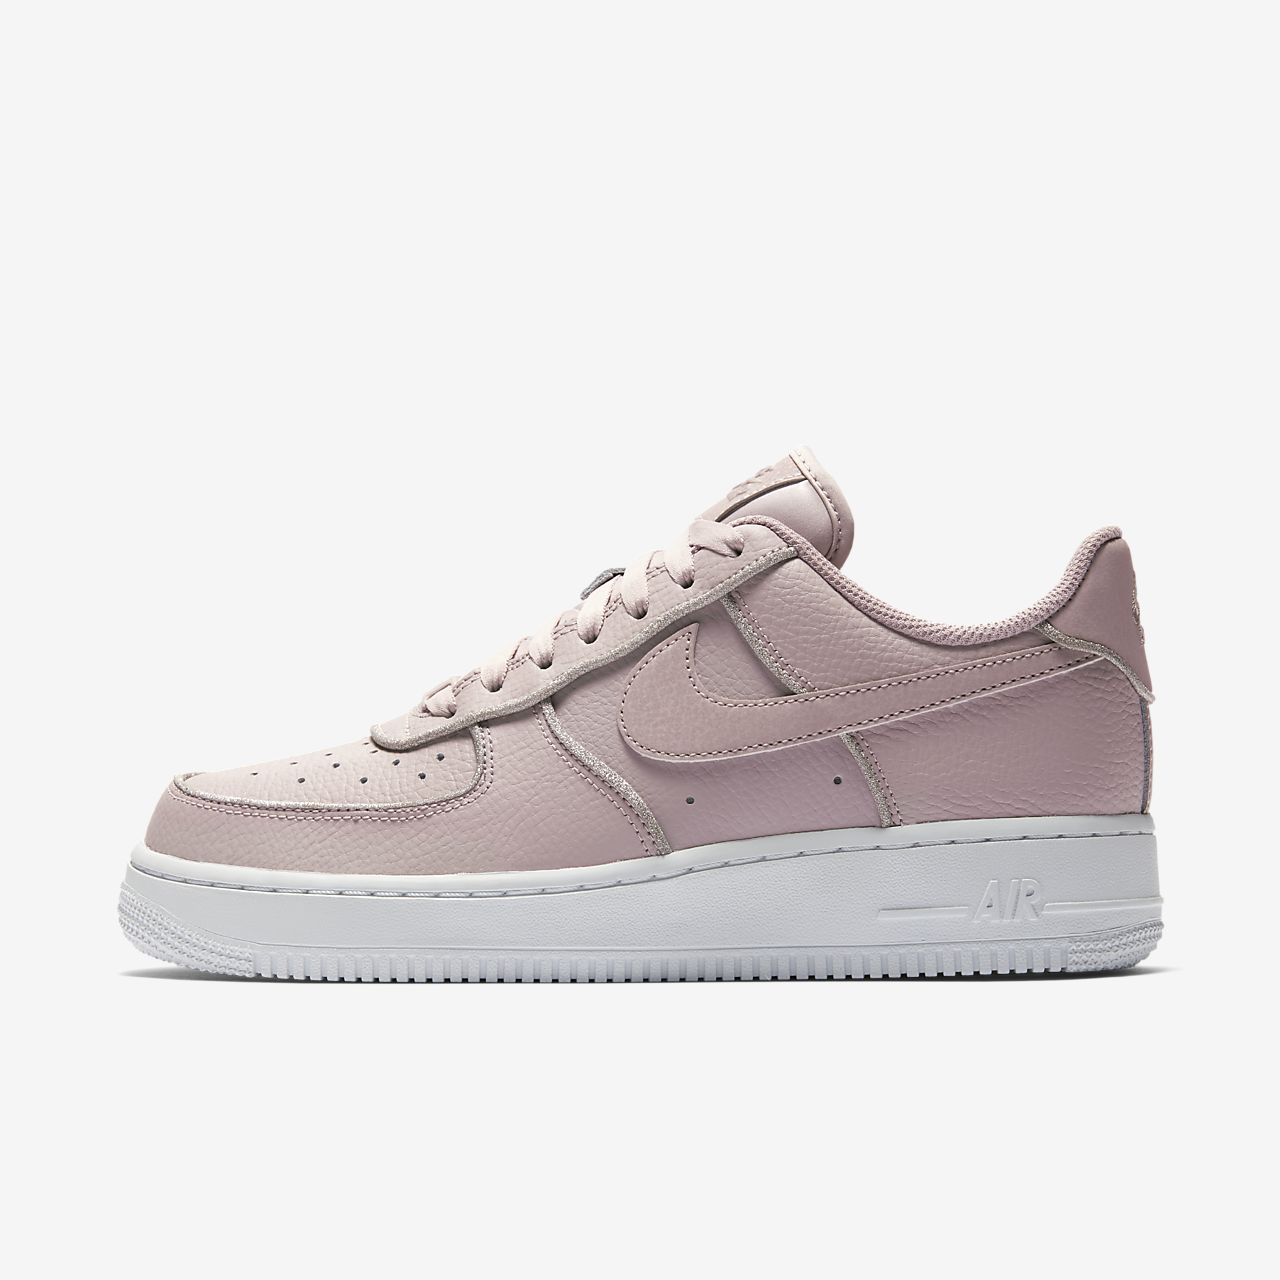 60d77e7d6e90d5 Nike Air Force 1 Low Glitter Women s Shoe. Nike.com PT